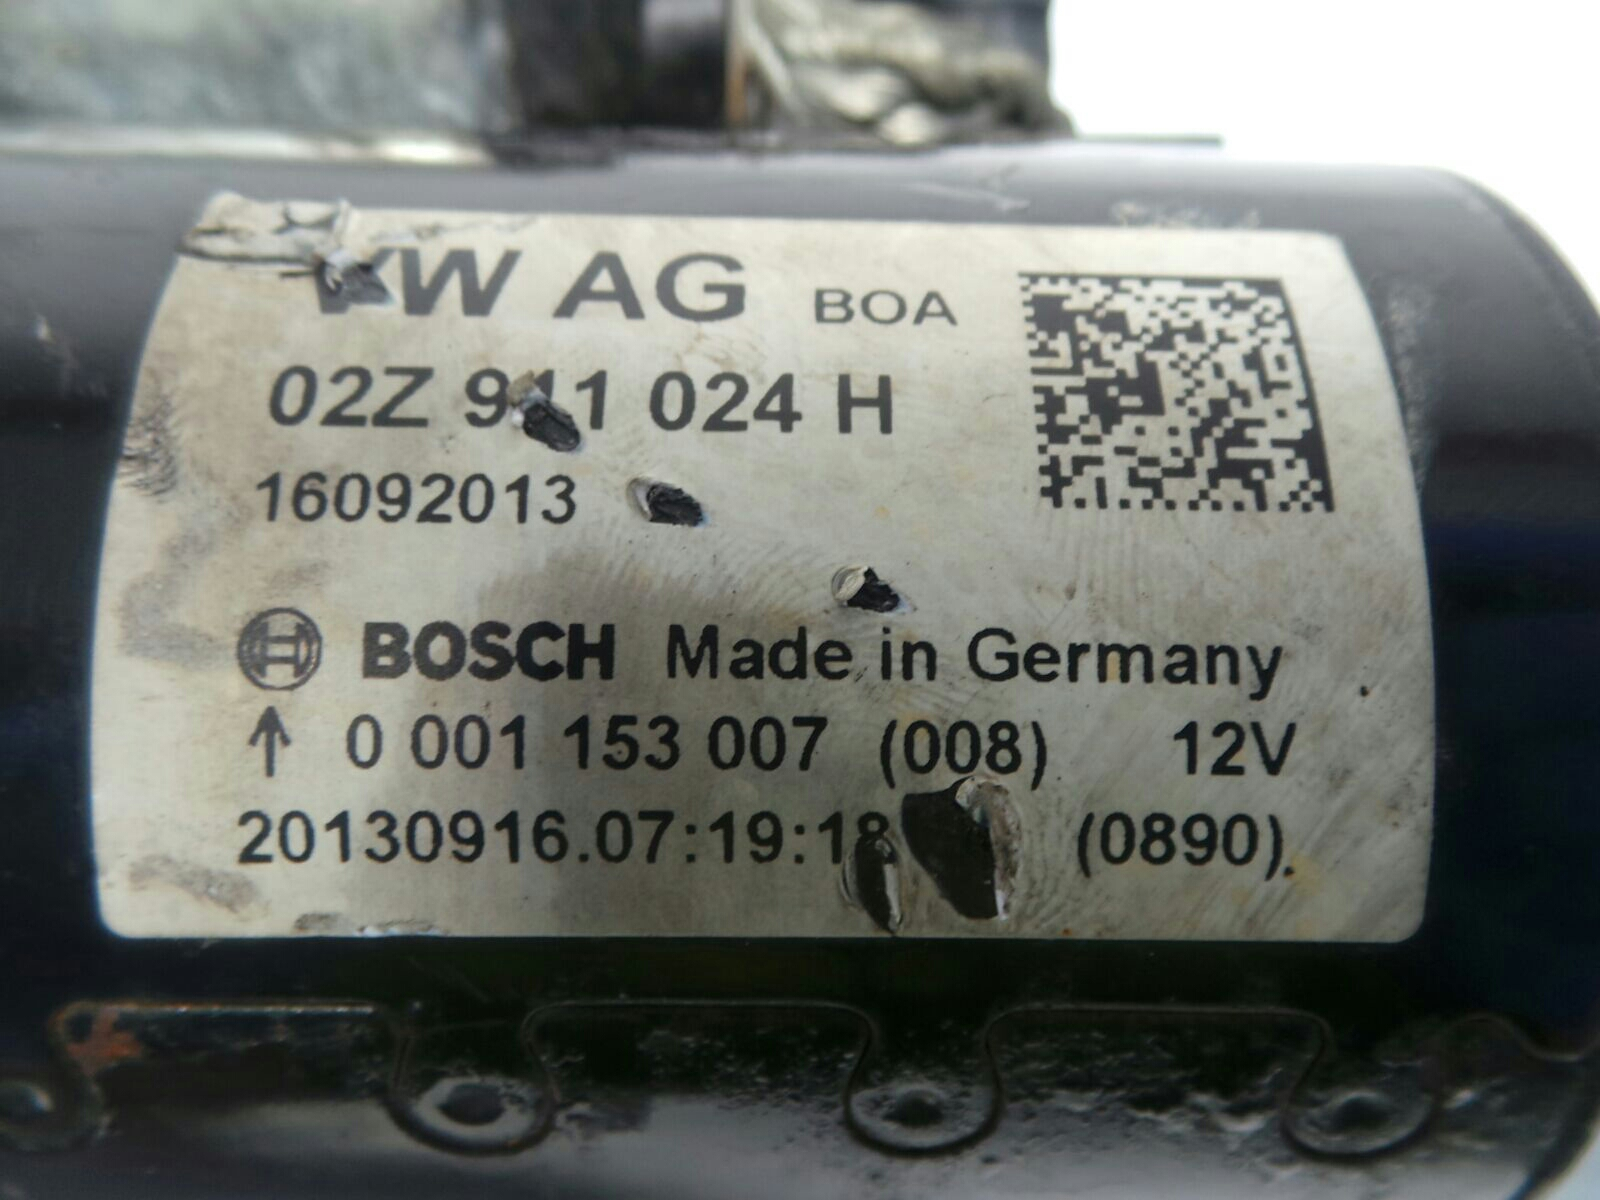 Volkswagen Caddy Maxi C20 2011 To 2015 Starter Motor Diesel Vw Fuse Box 2012 15 16 Manual Cayd Warranty 5135095